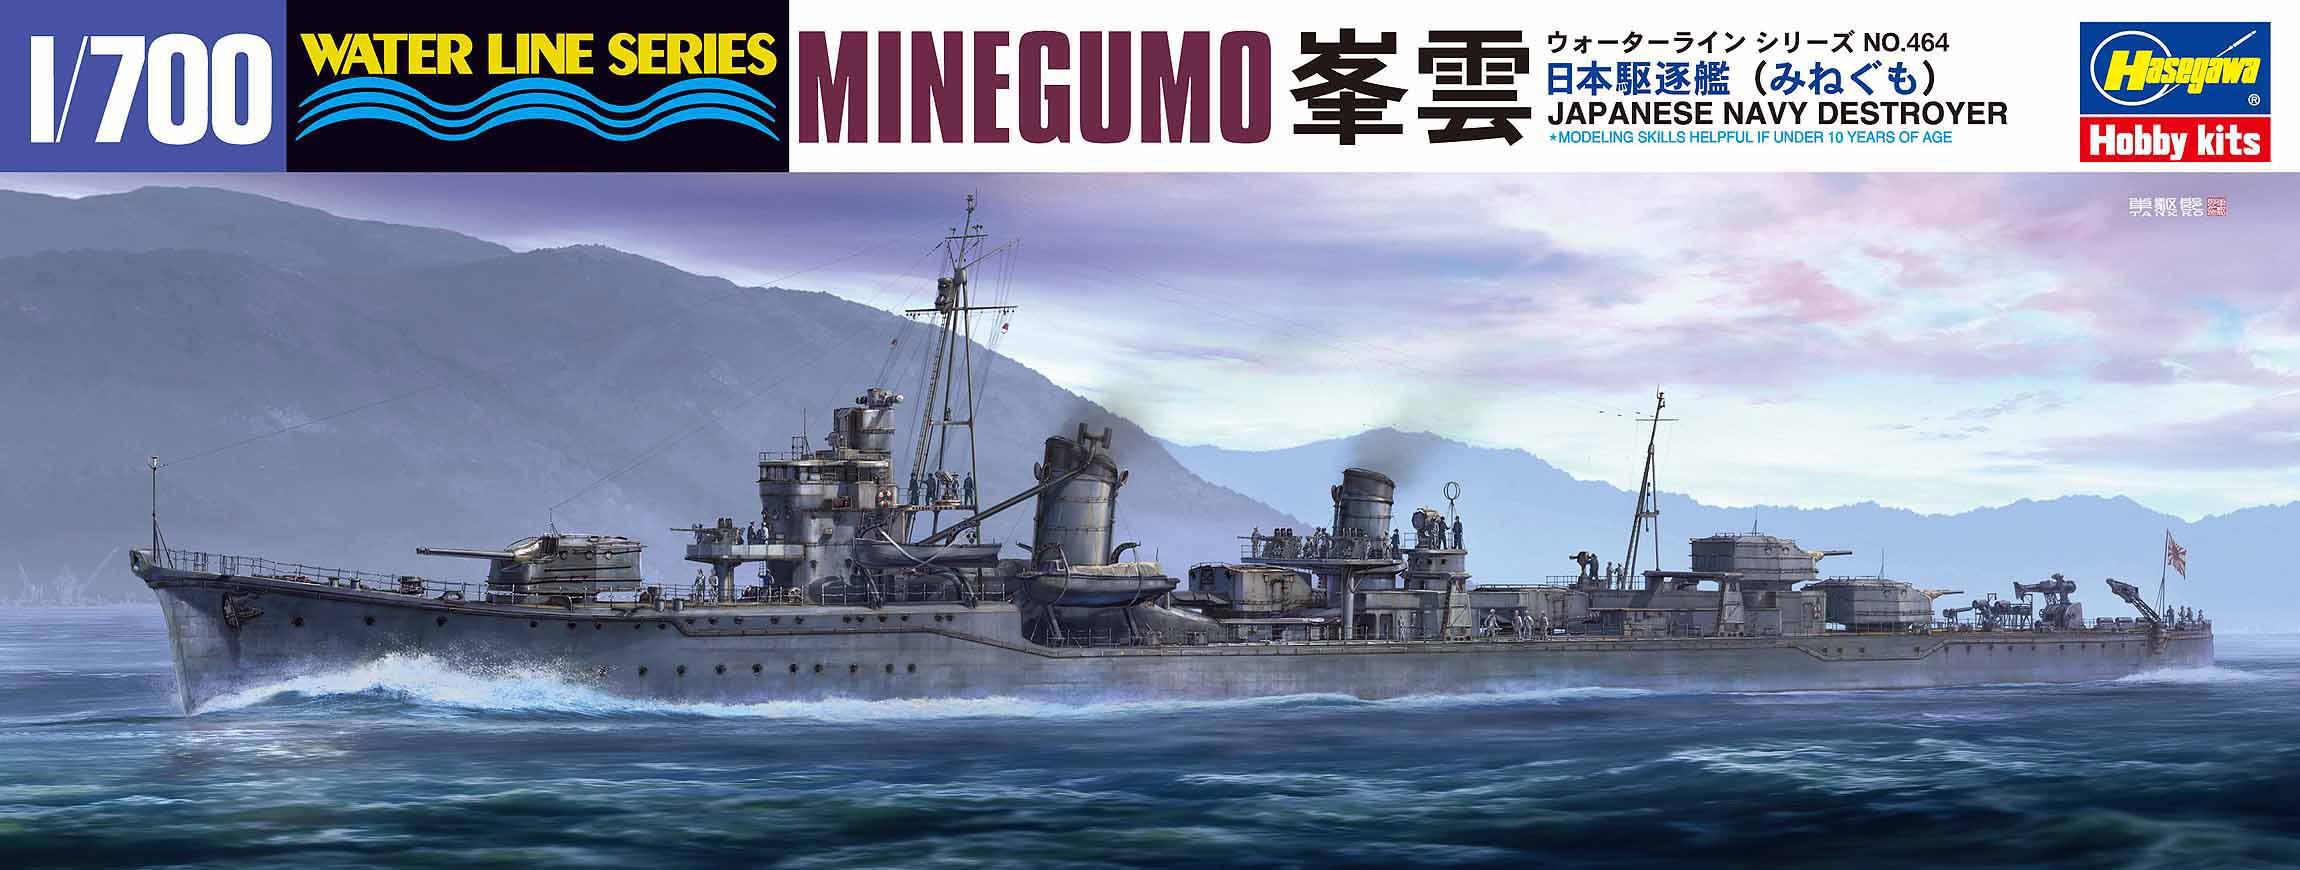 Hasegawa Ijn Destroyer Minegumo